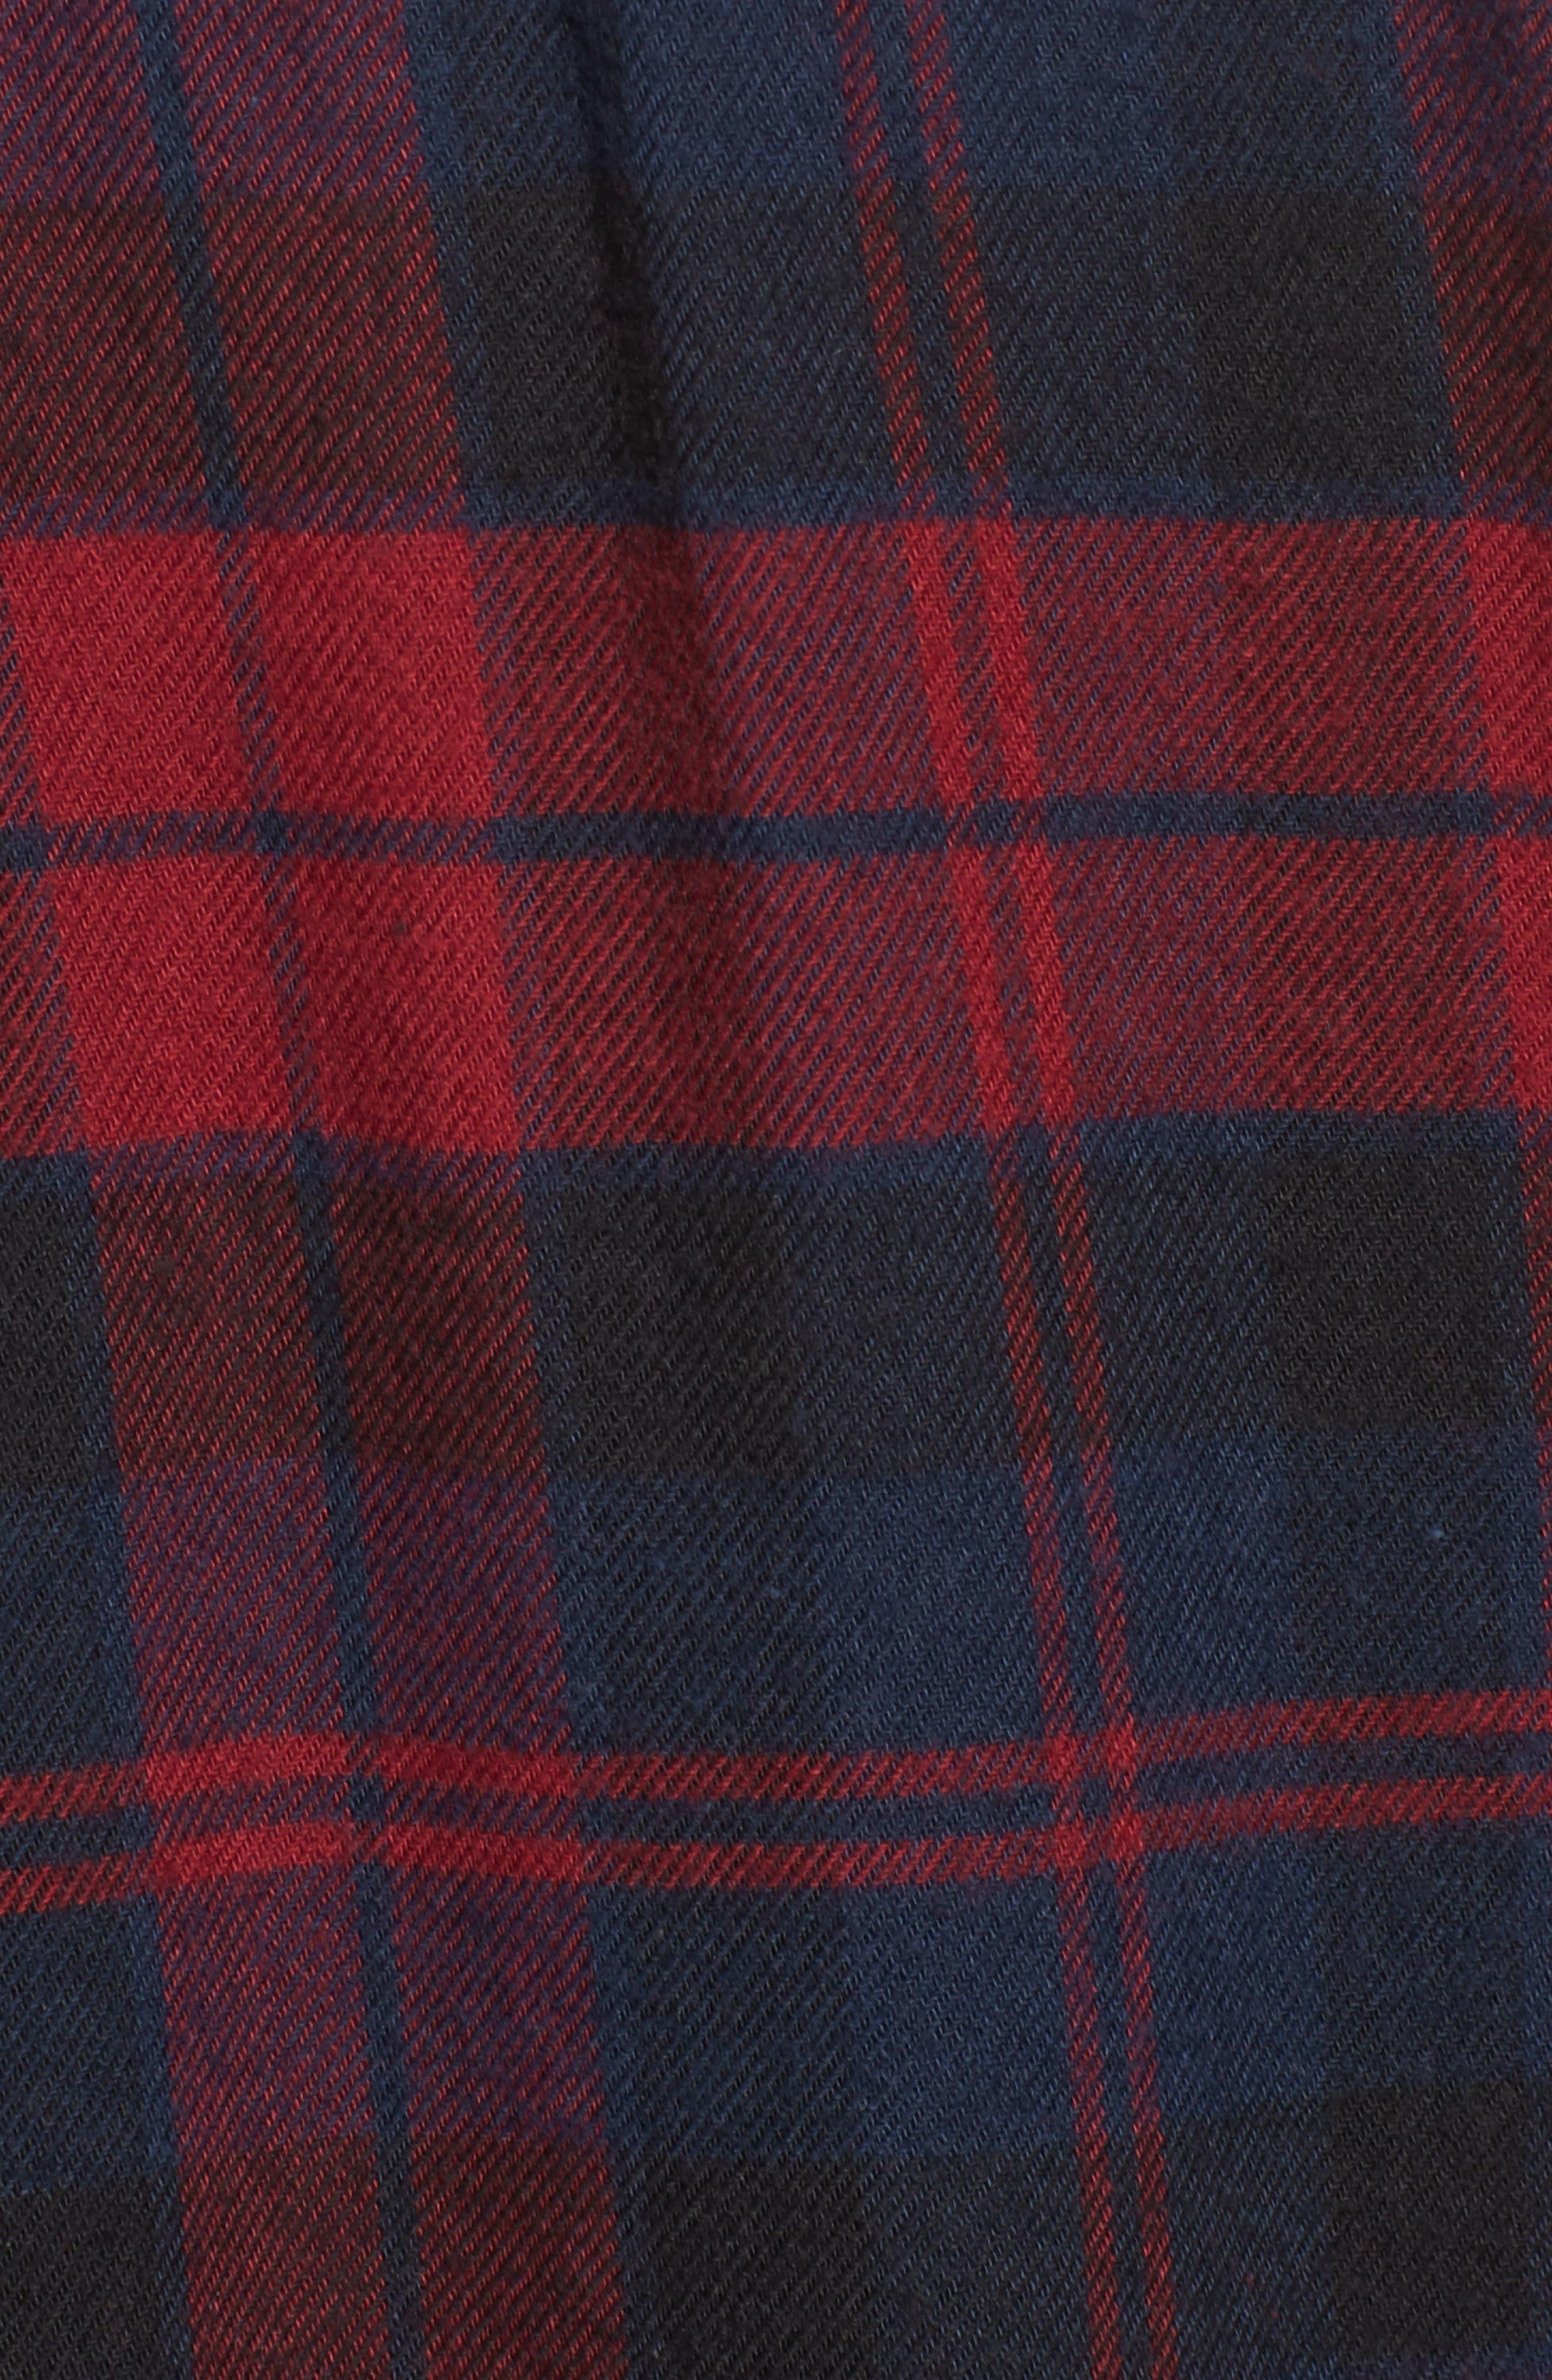 Rex Studded Plaid Shirt,                             Alternate thumbnail 5, color,                             622